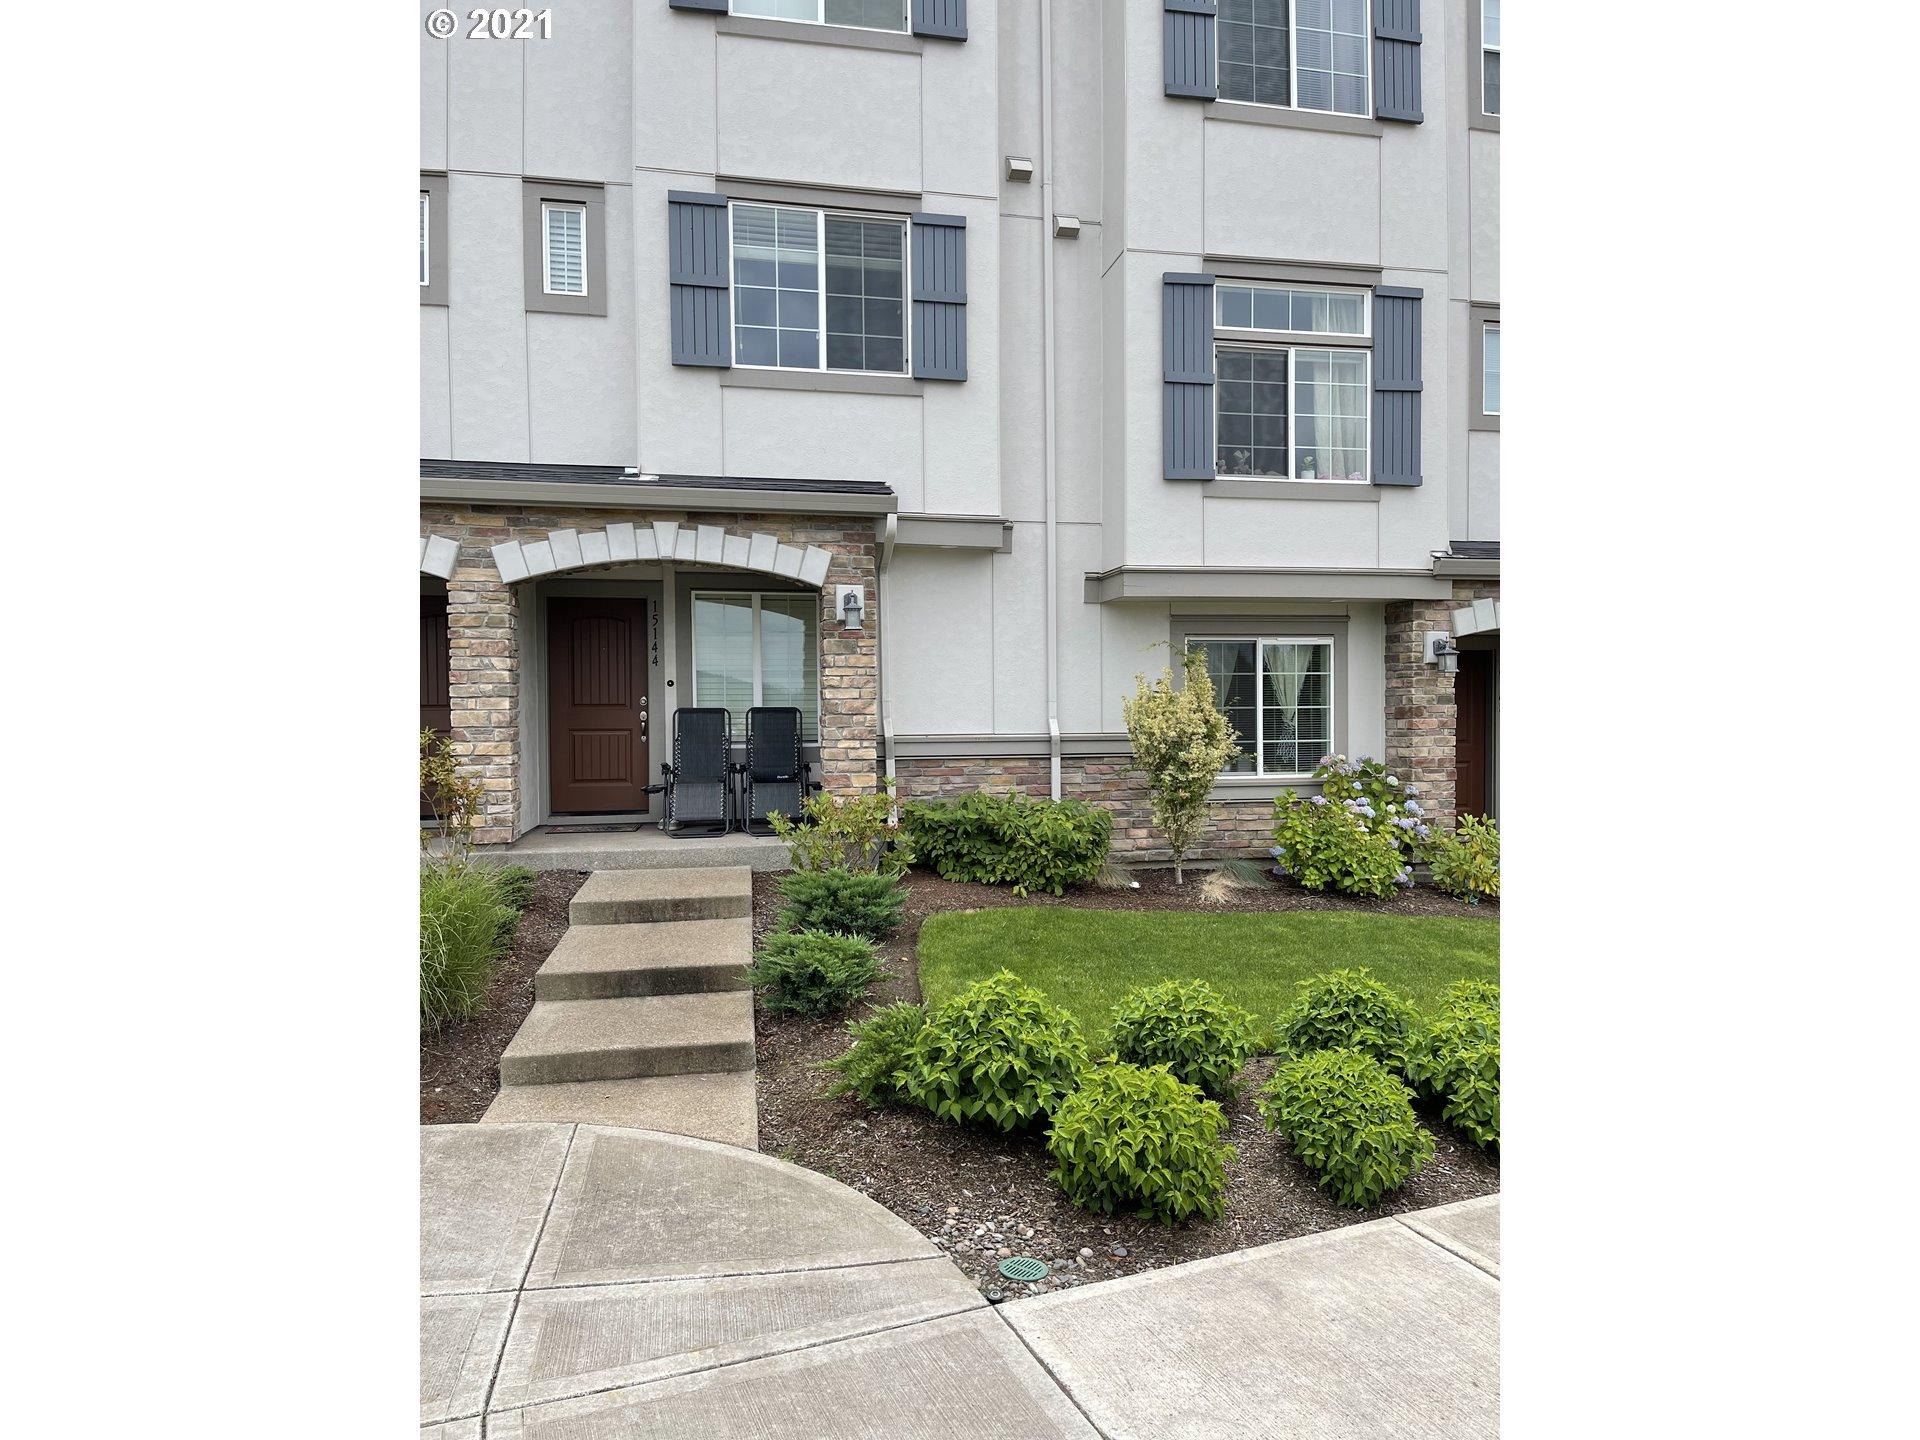 15144 NW MARIANNA ST, Portland OR 97210